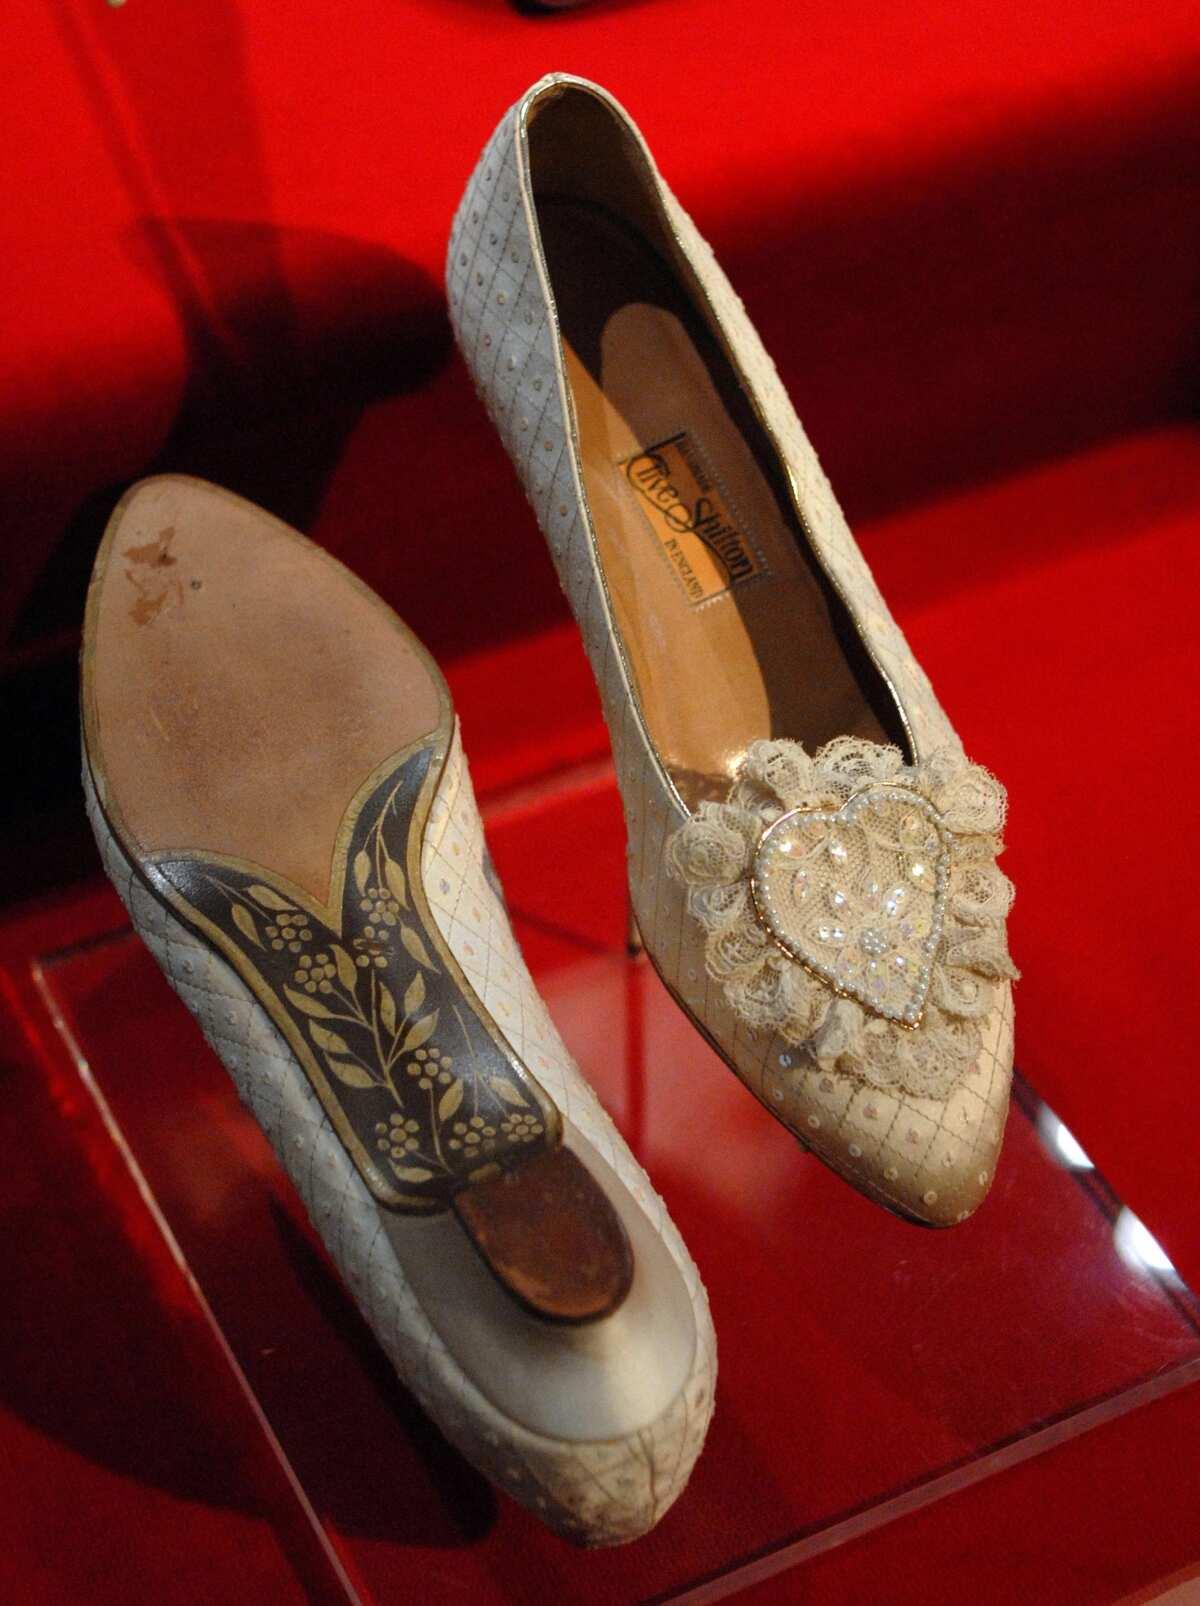 Princess Diana's wedding slippers